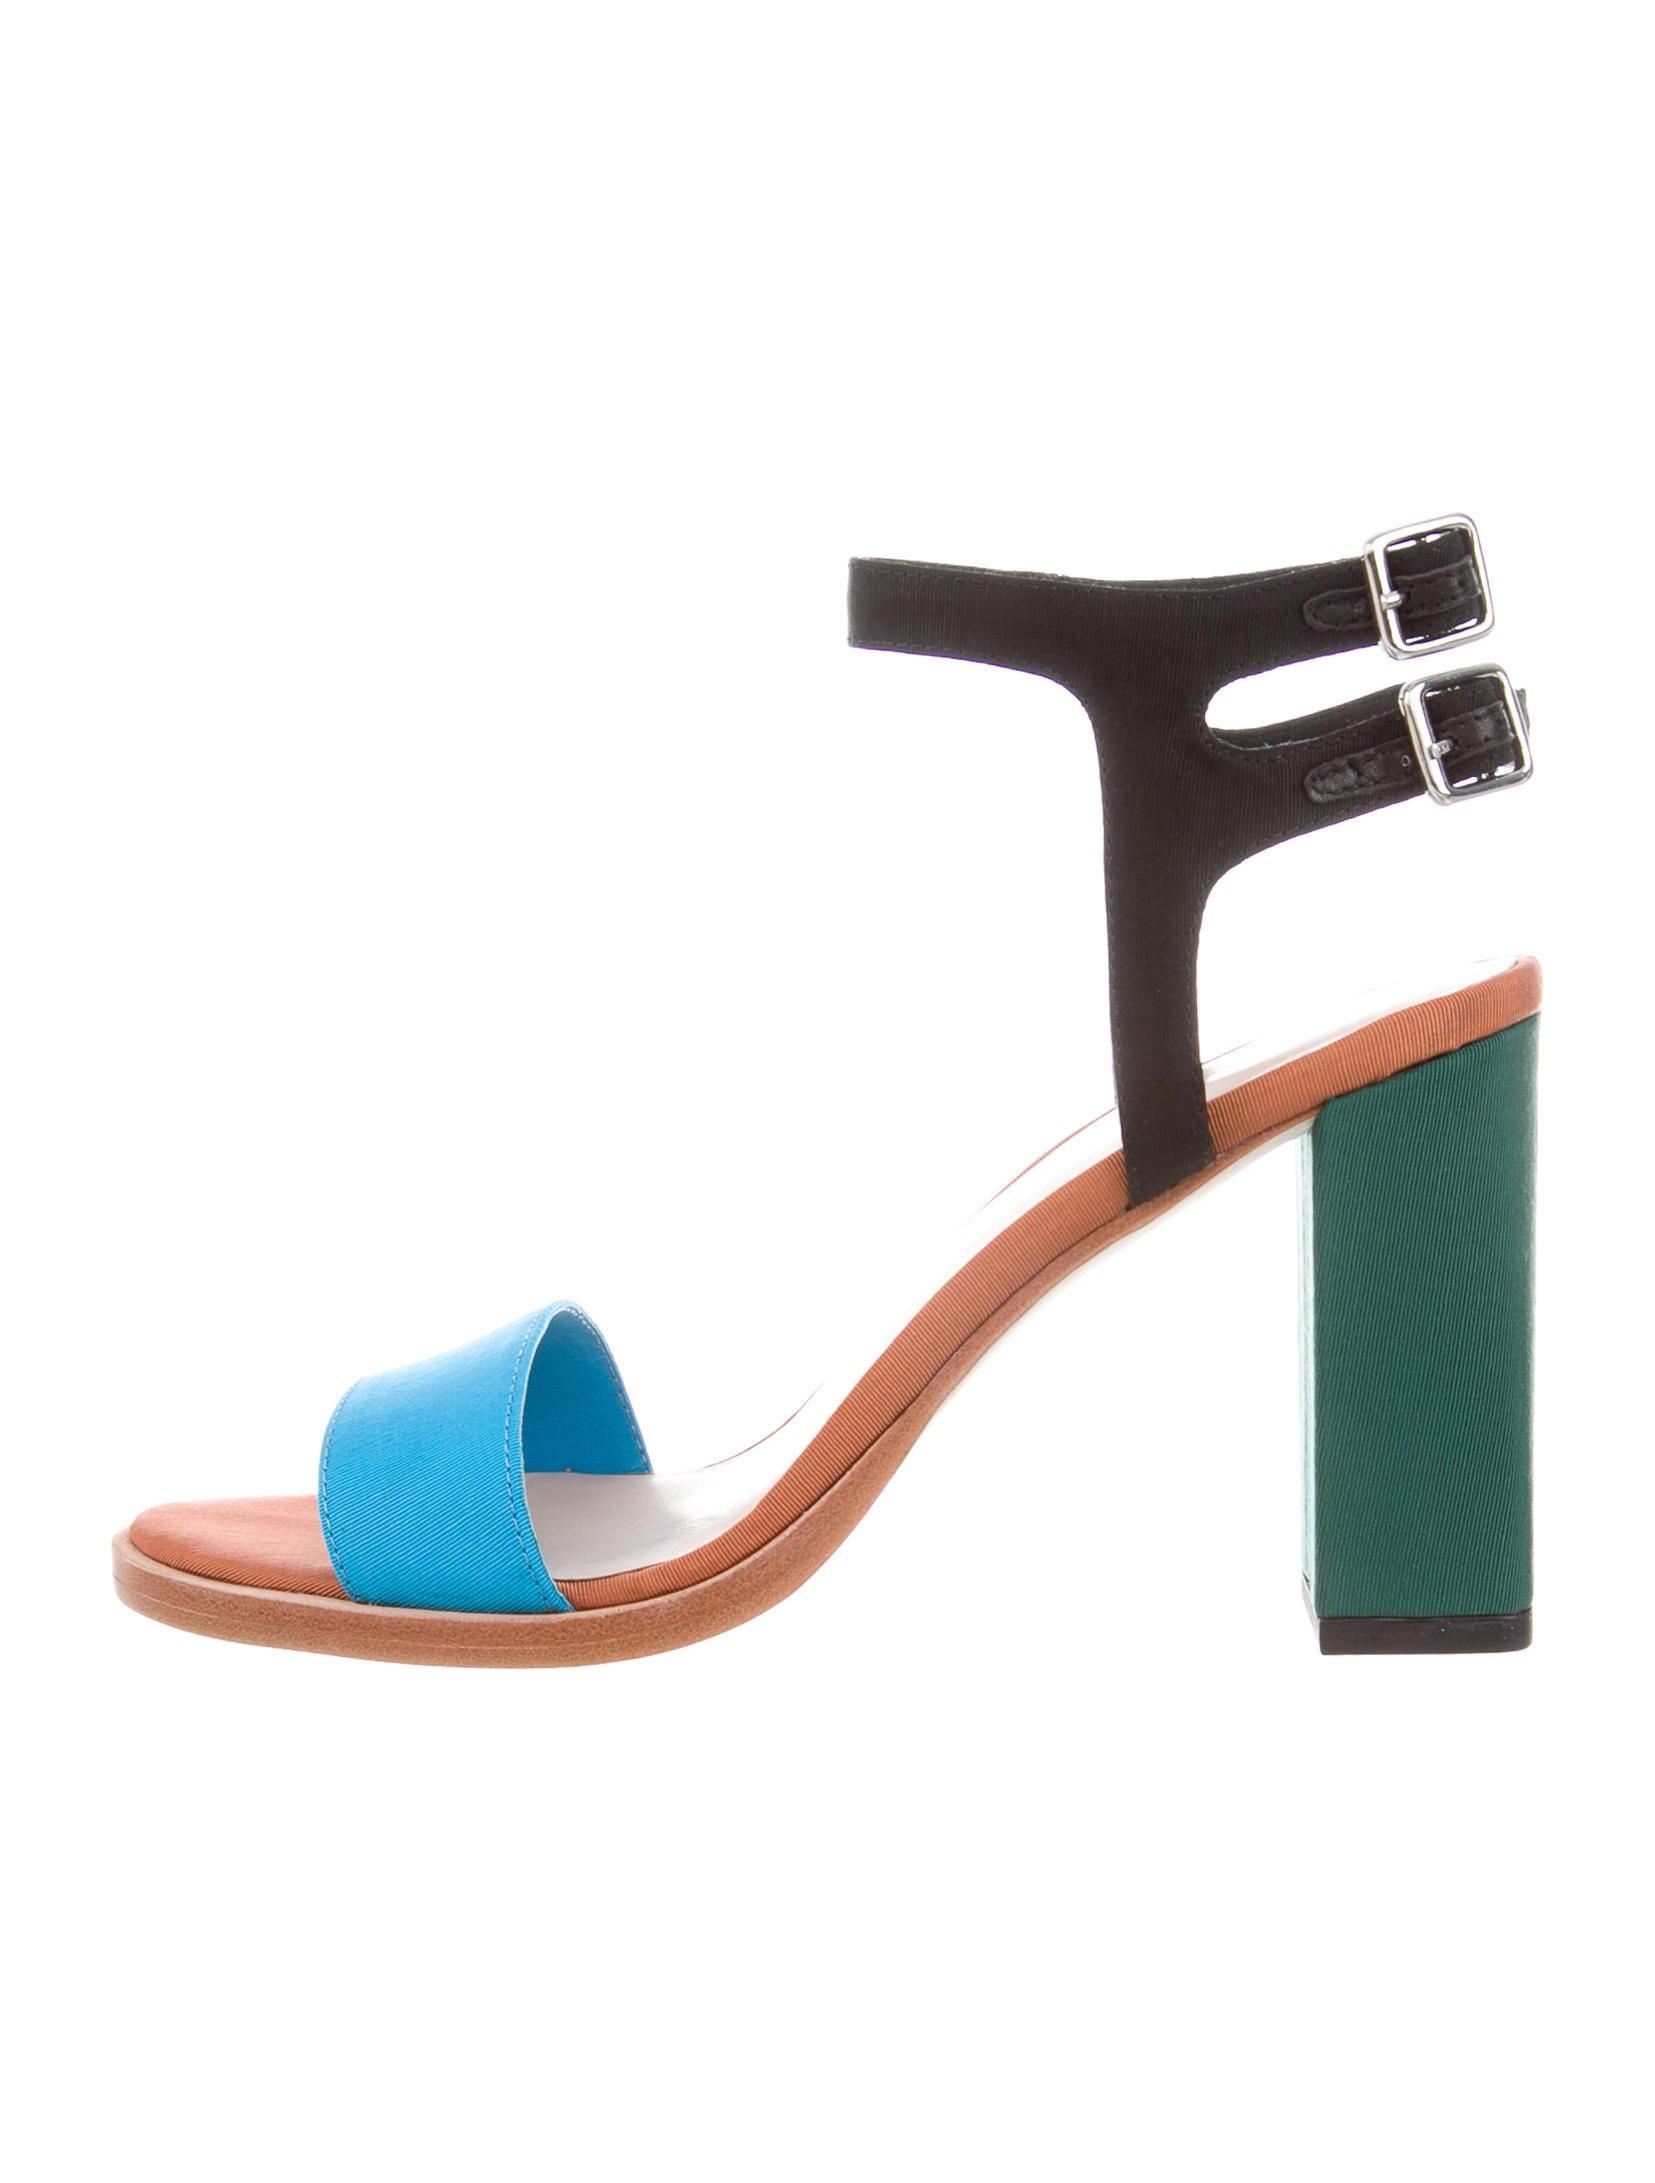 81a806e1596f Loeffler Randall Sylvia Colorblock Sandals w  Tags - Shoes ...